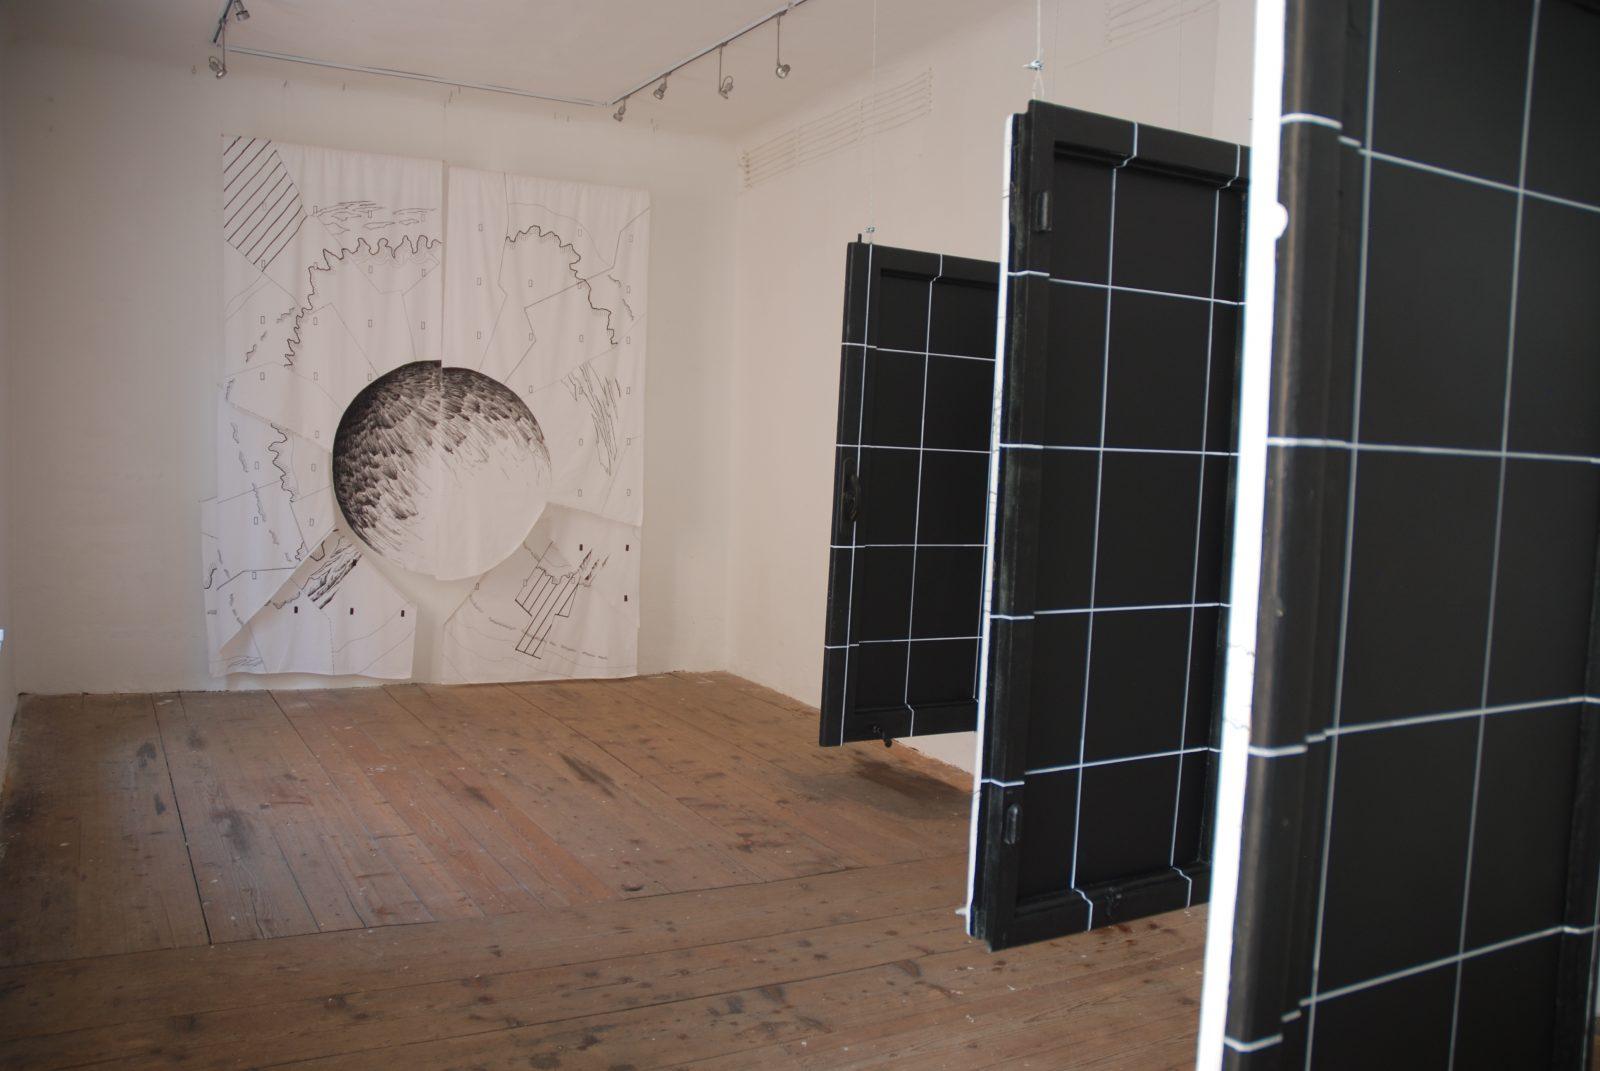 NÖ Waldviertel Galerie Kunst - Perspektiven Groß-Siegharts